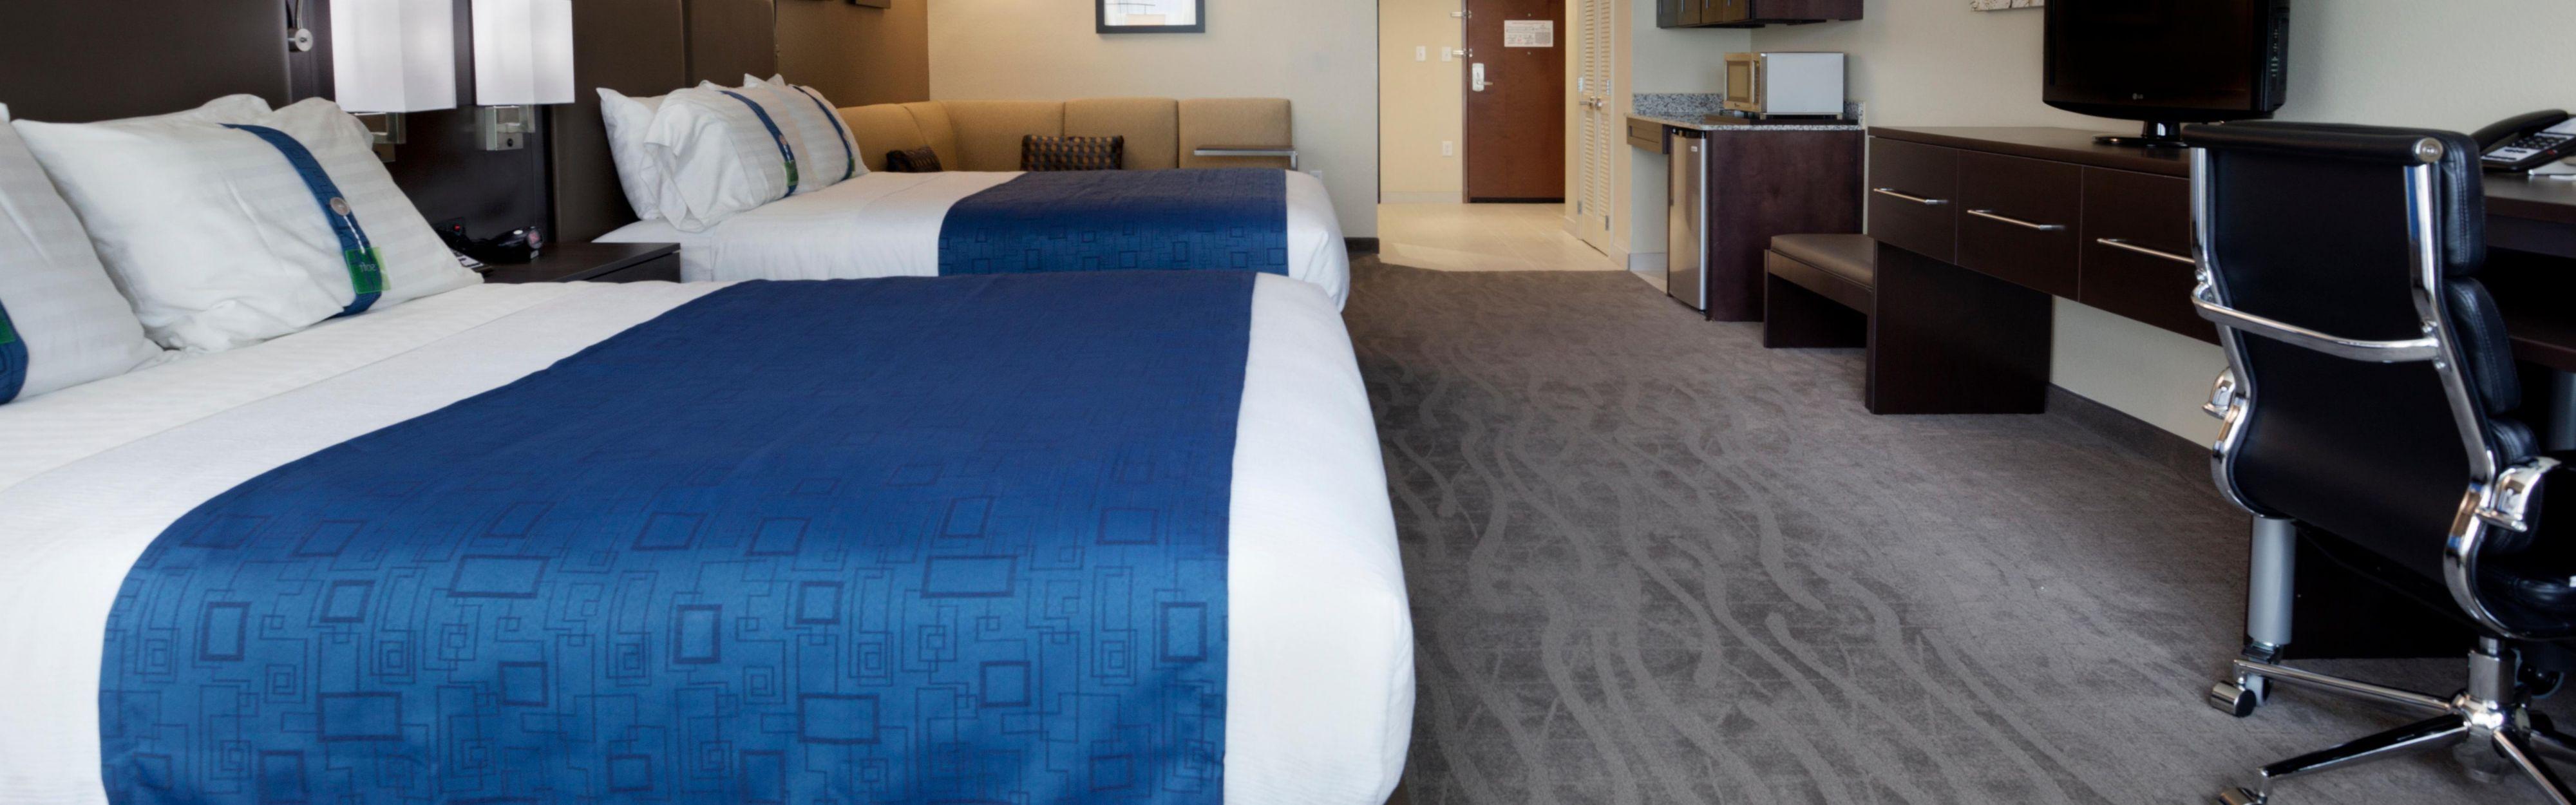 Image Result For Holiday Inn Near Me San Antonio